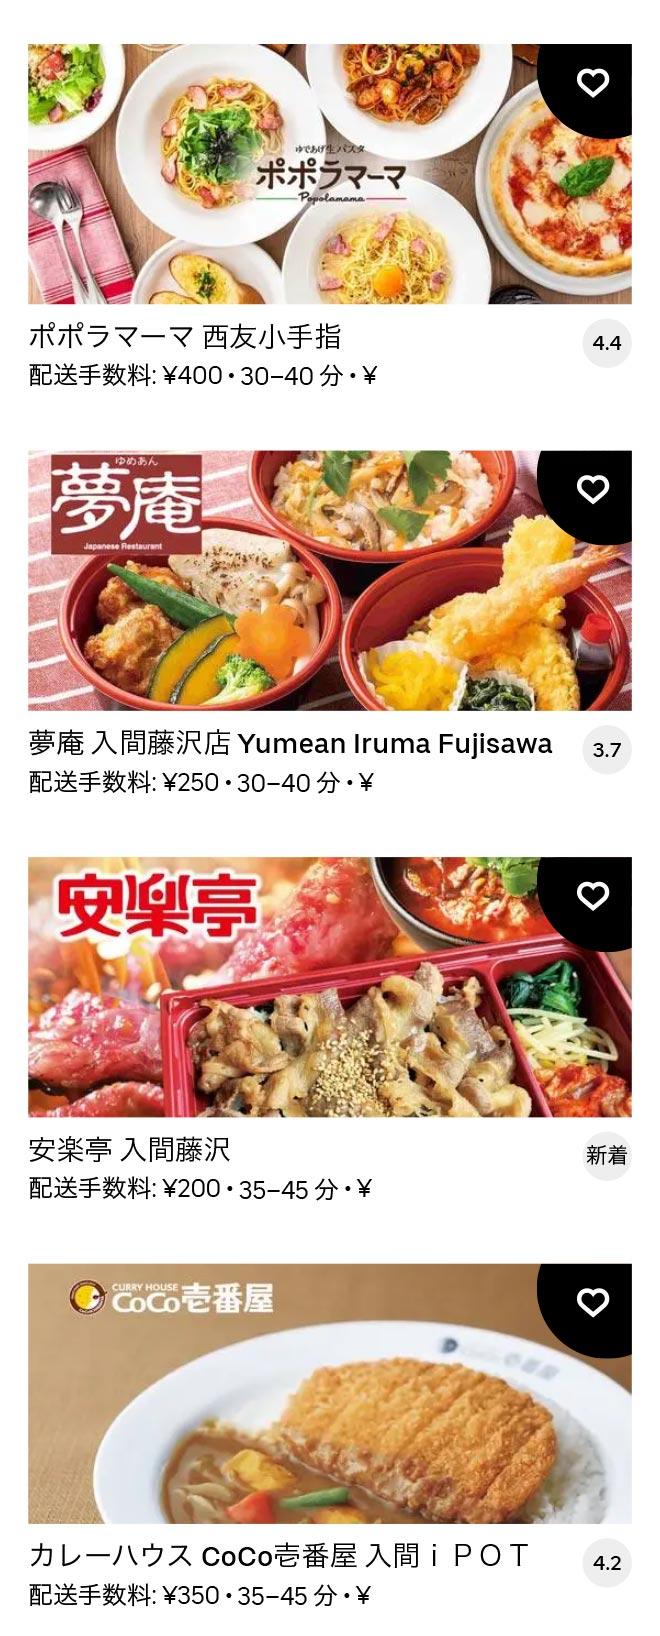 Musashi fujisawa menu 2101 09